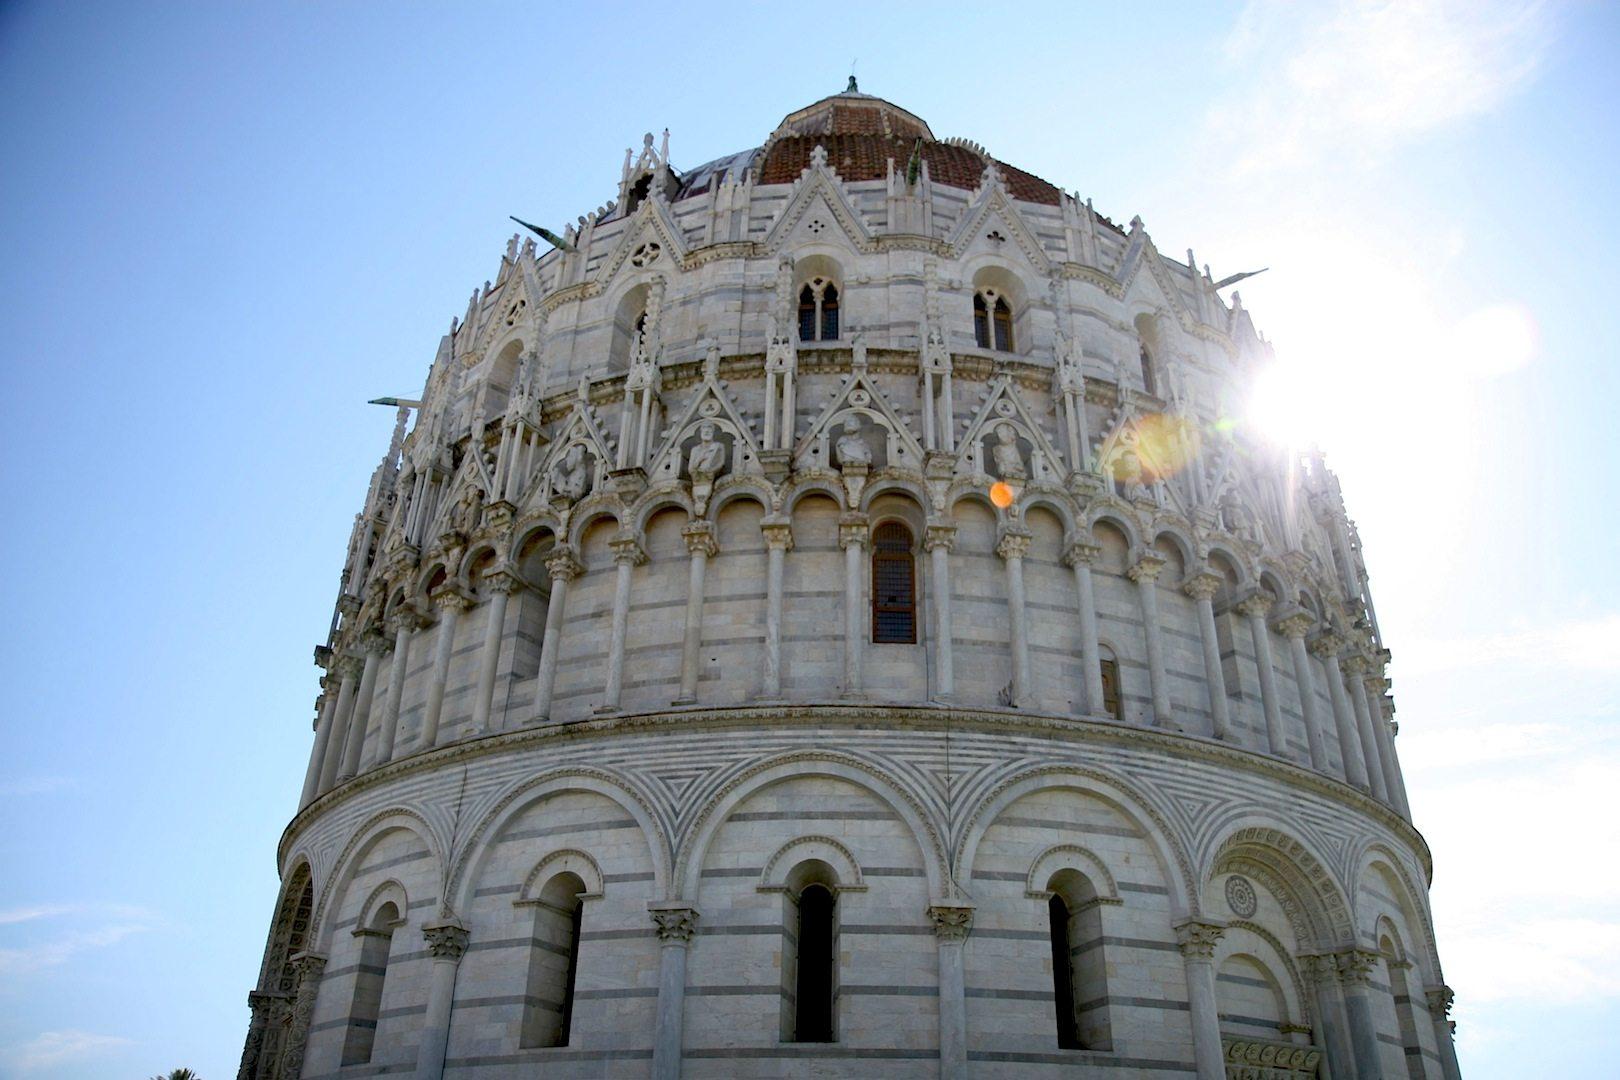 Baptisterium. Taufkirche des Doms in Pisa